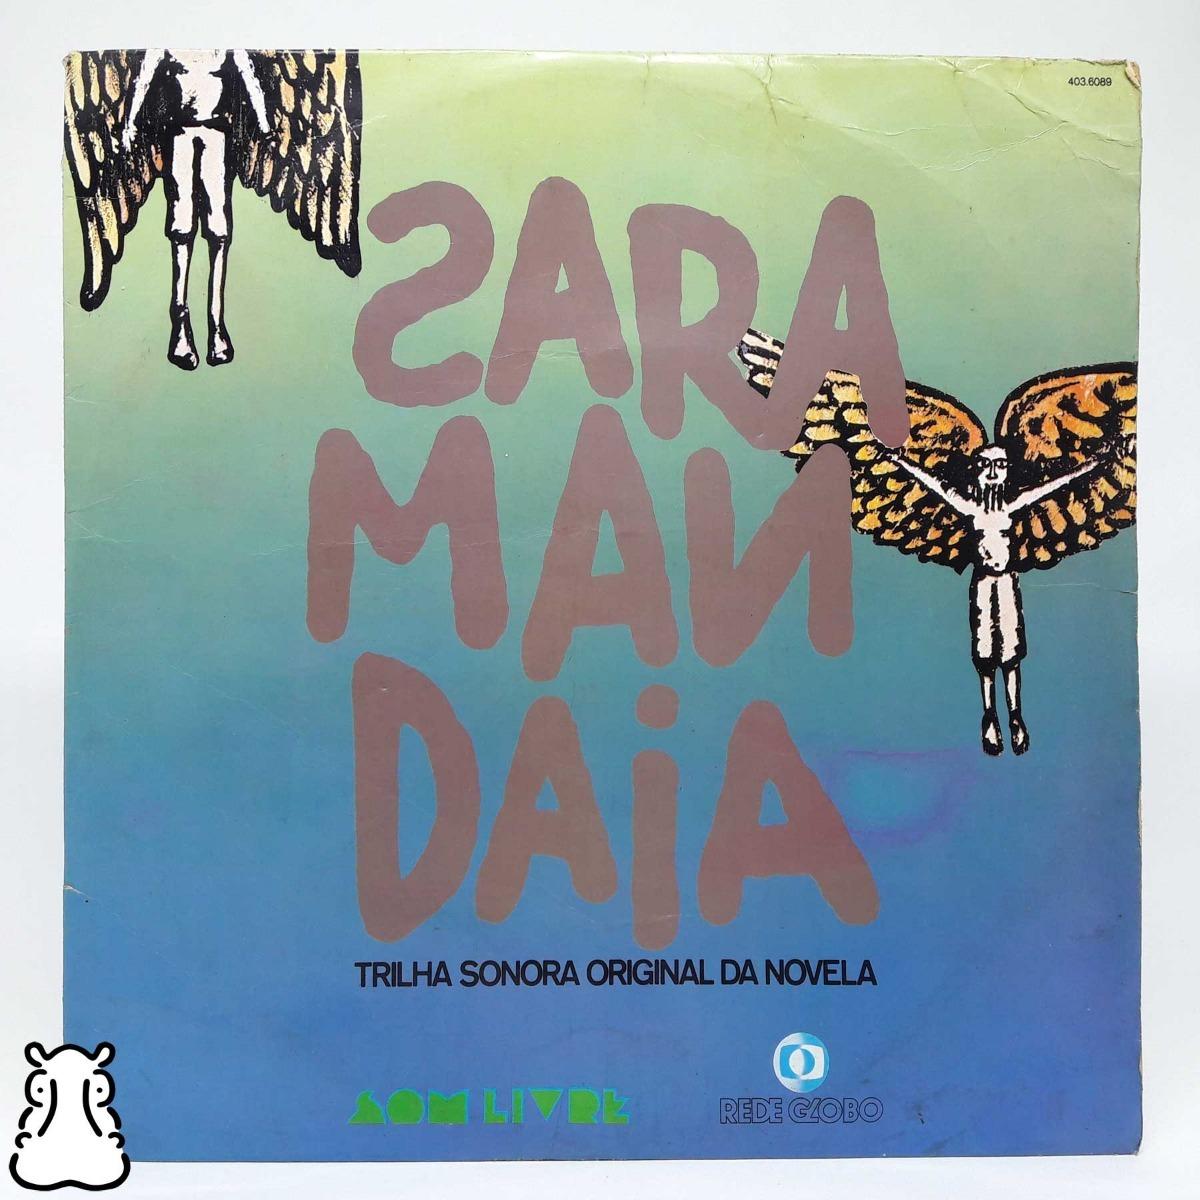 trilha sonora da novela saramandaia